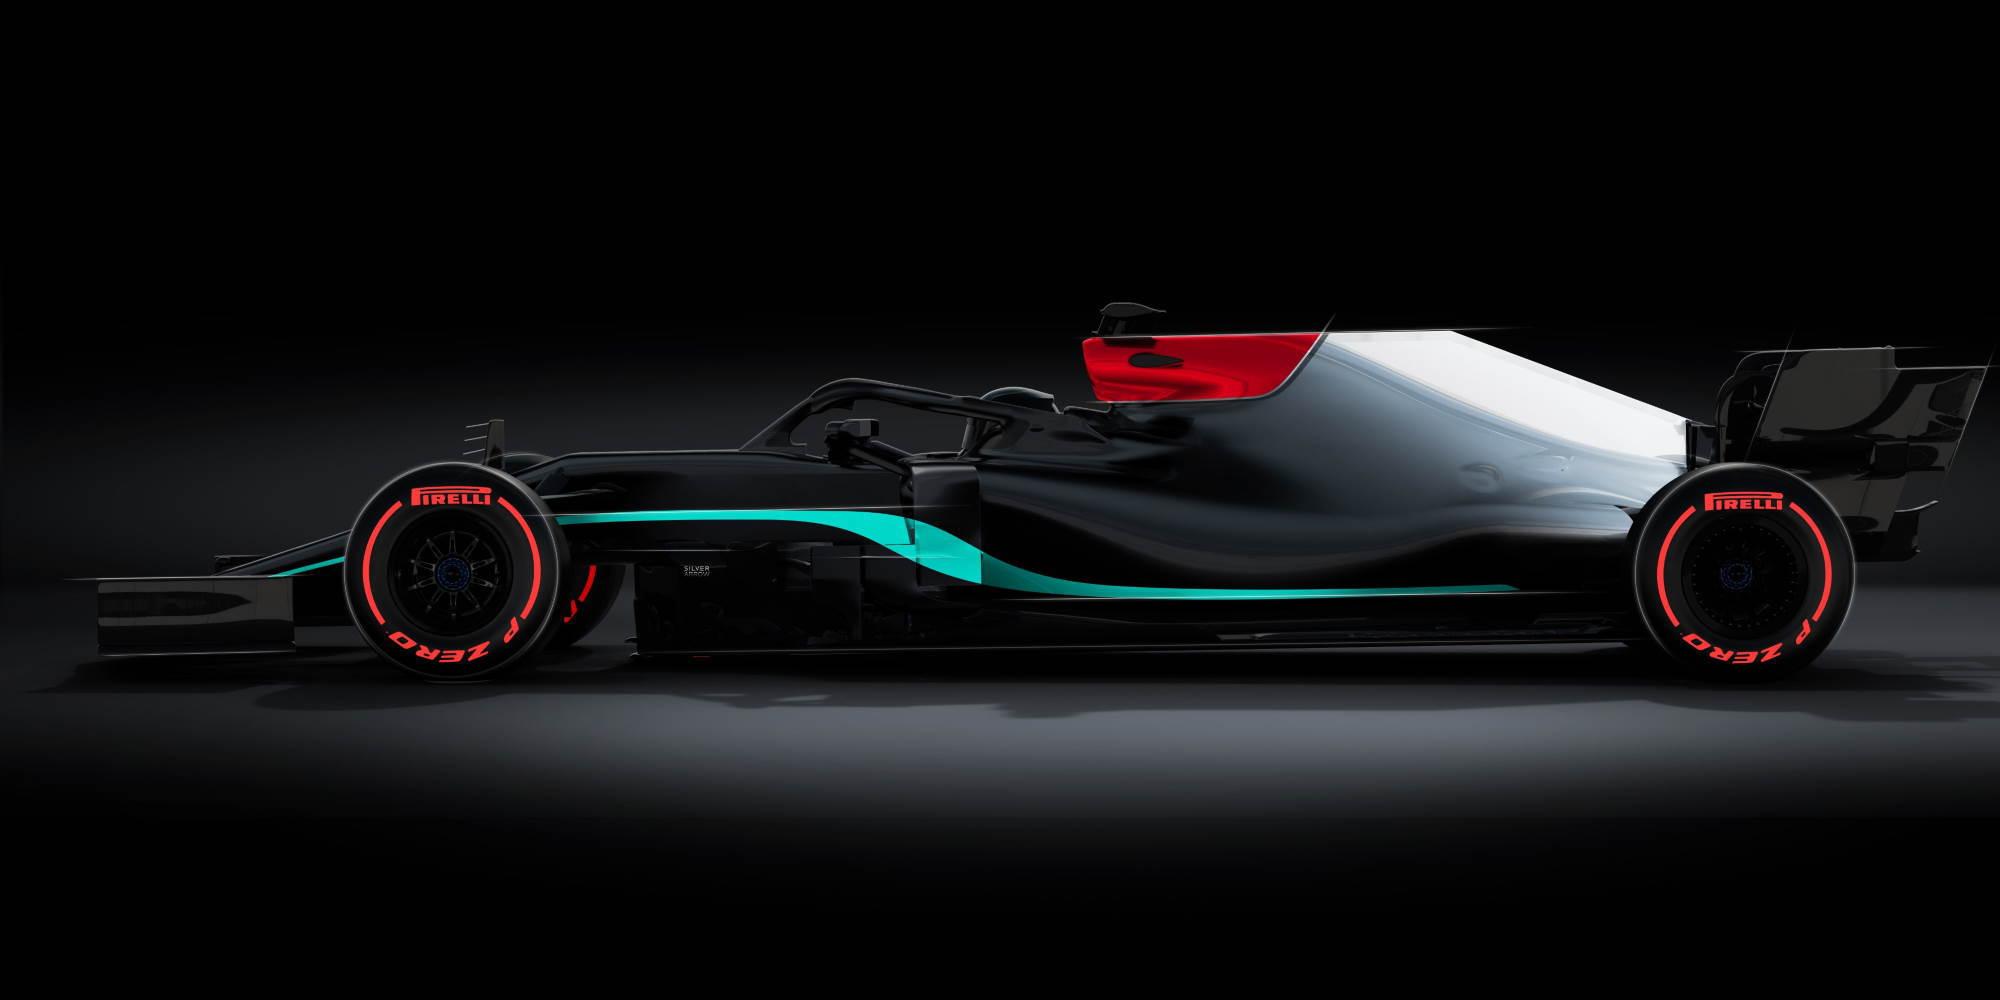 2021 Mercedes F1 W12 livery teaser Photo Mercedes AMG Petronas Twitter